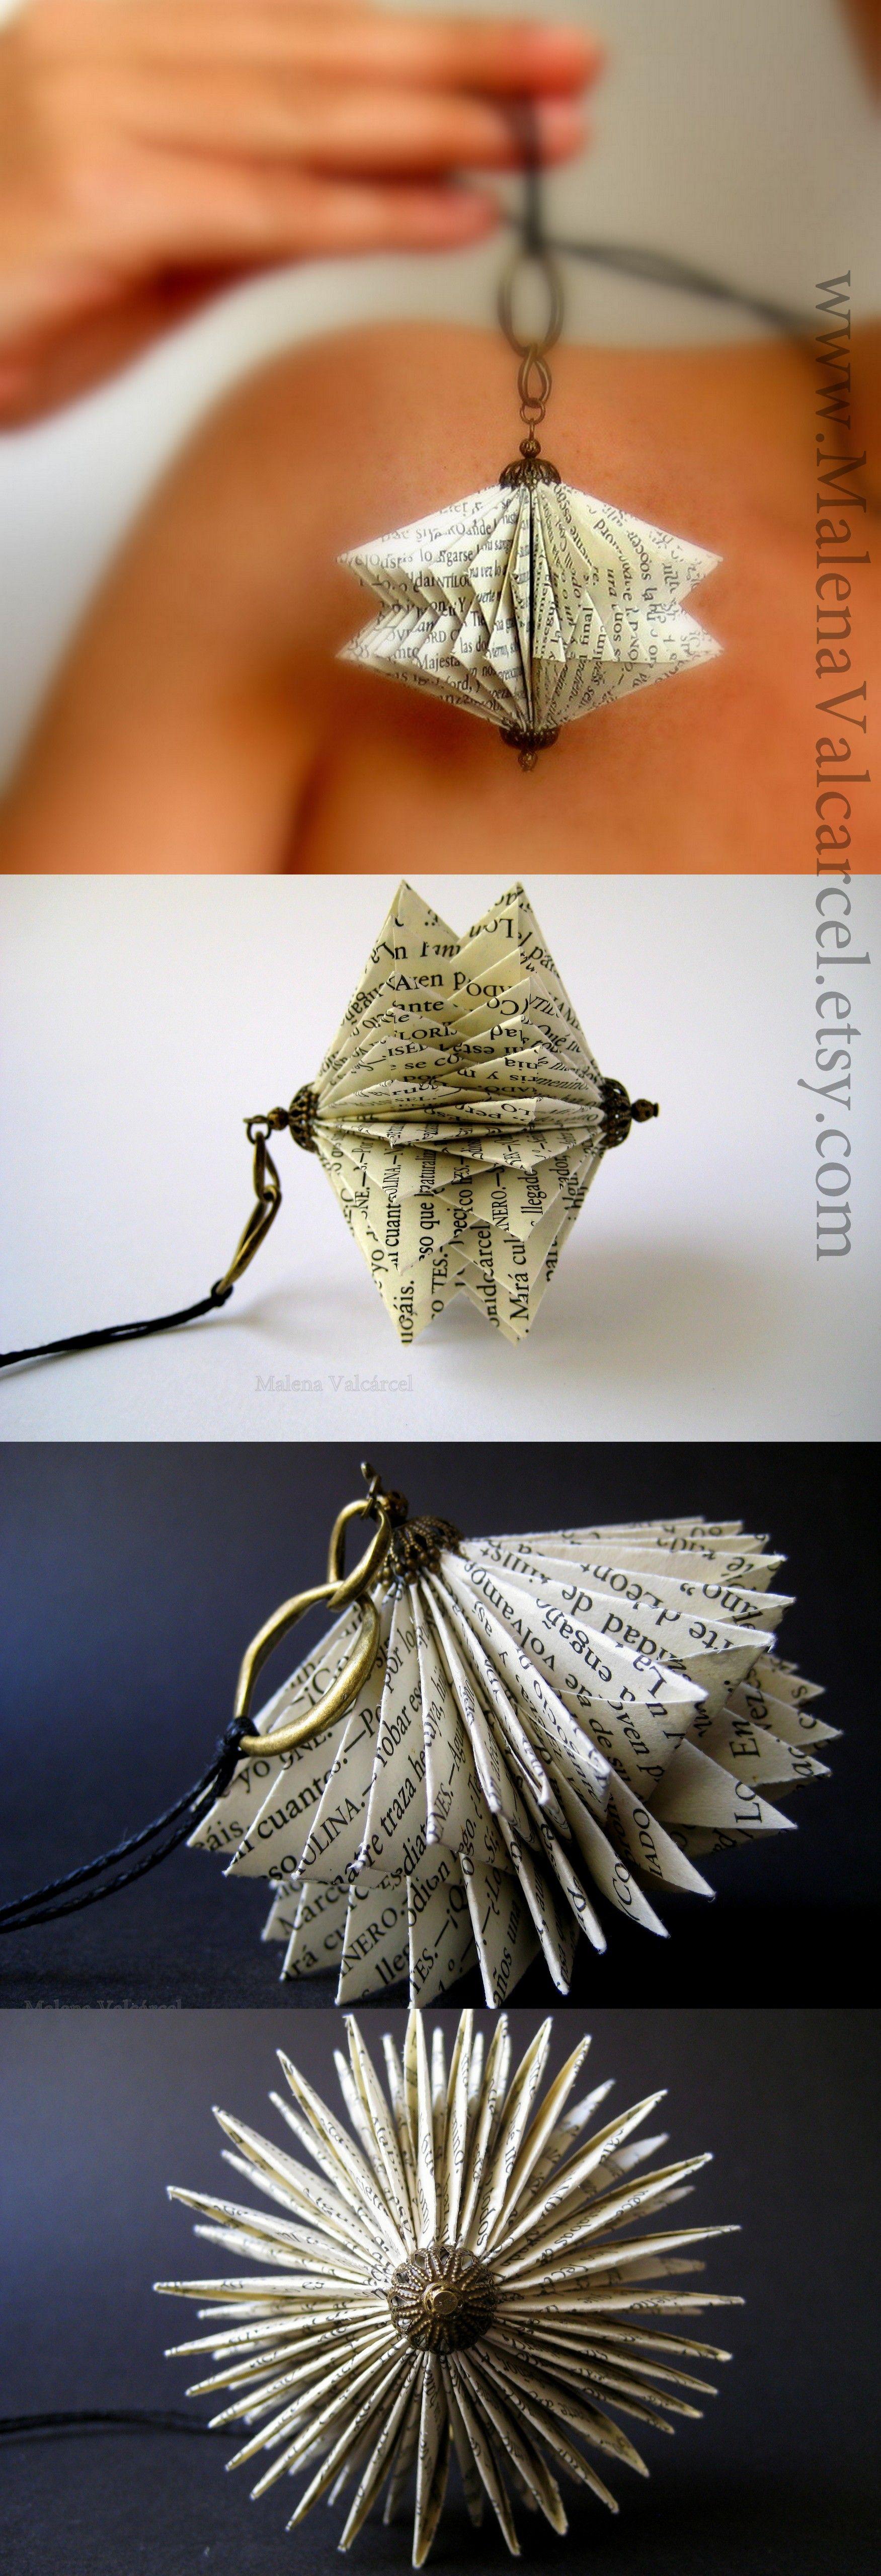 Paper jewelry by Malena Valcarcel. Bisutería de Papel por Malena Valcárcel.